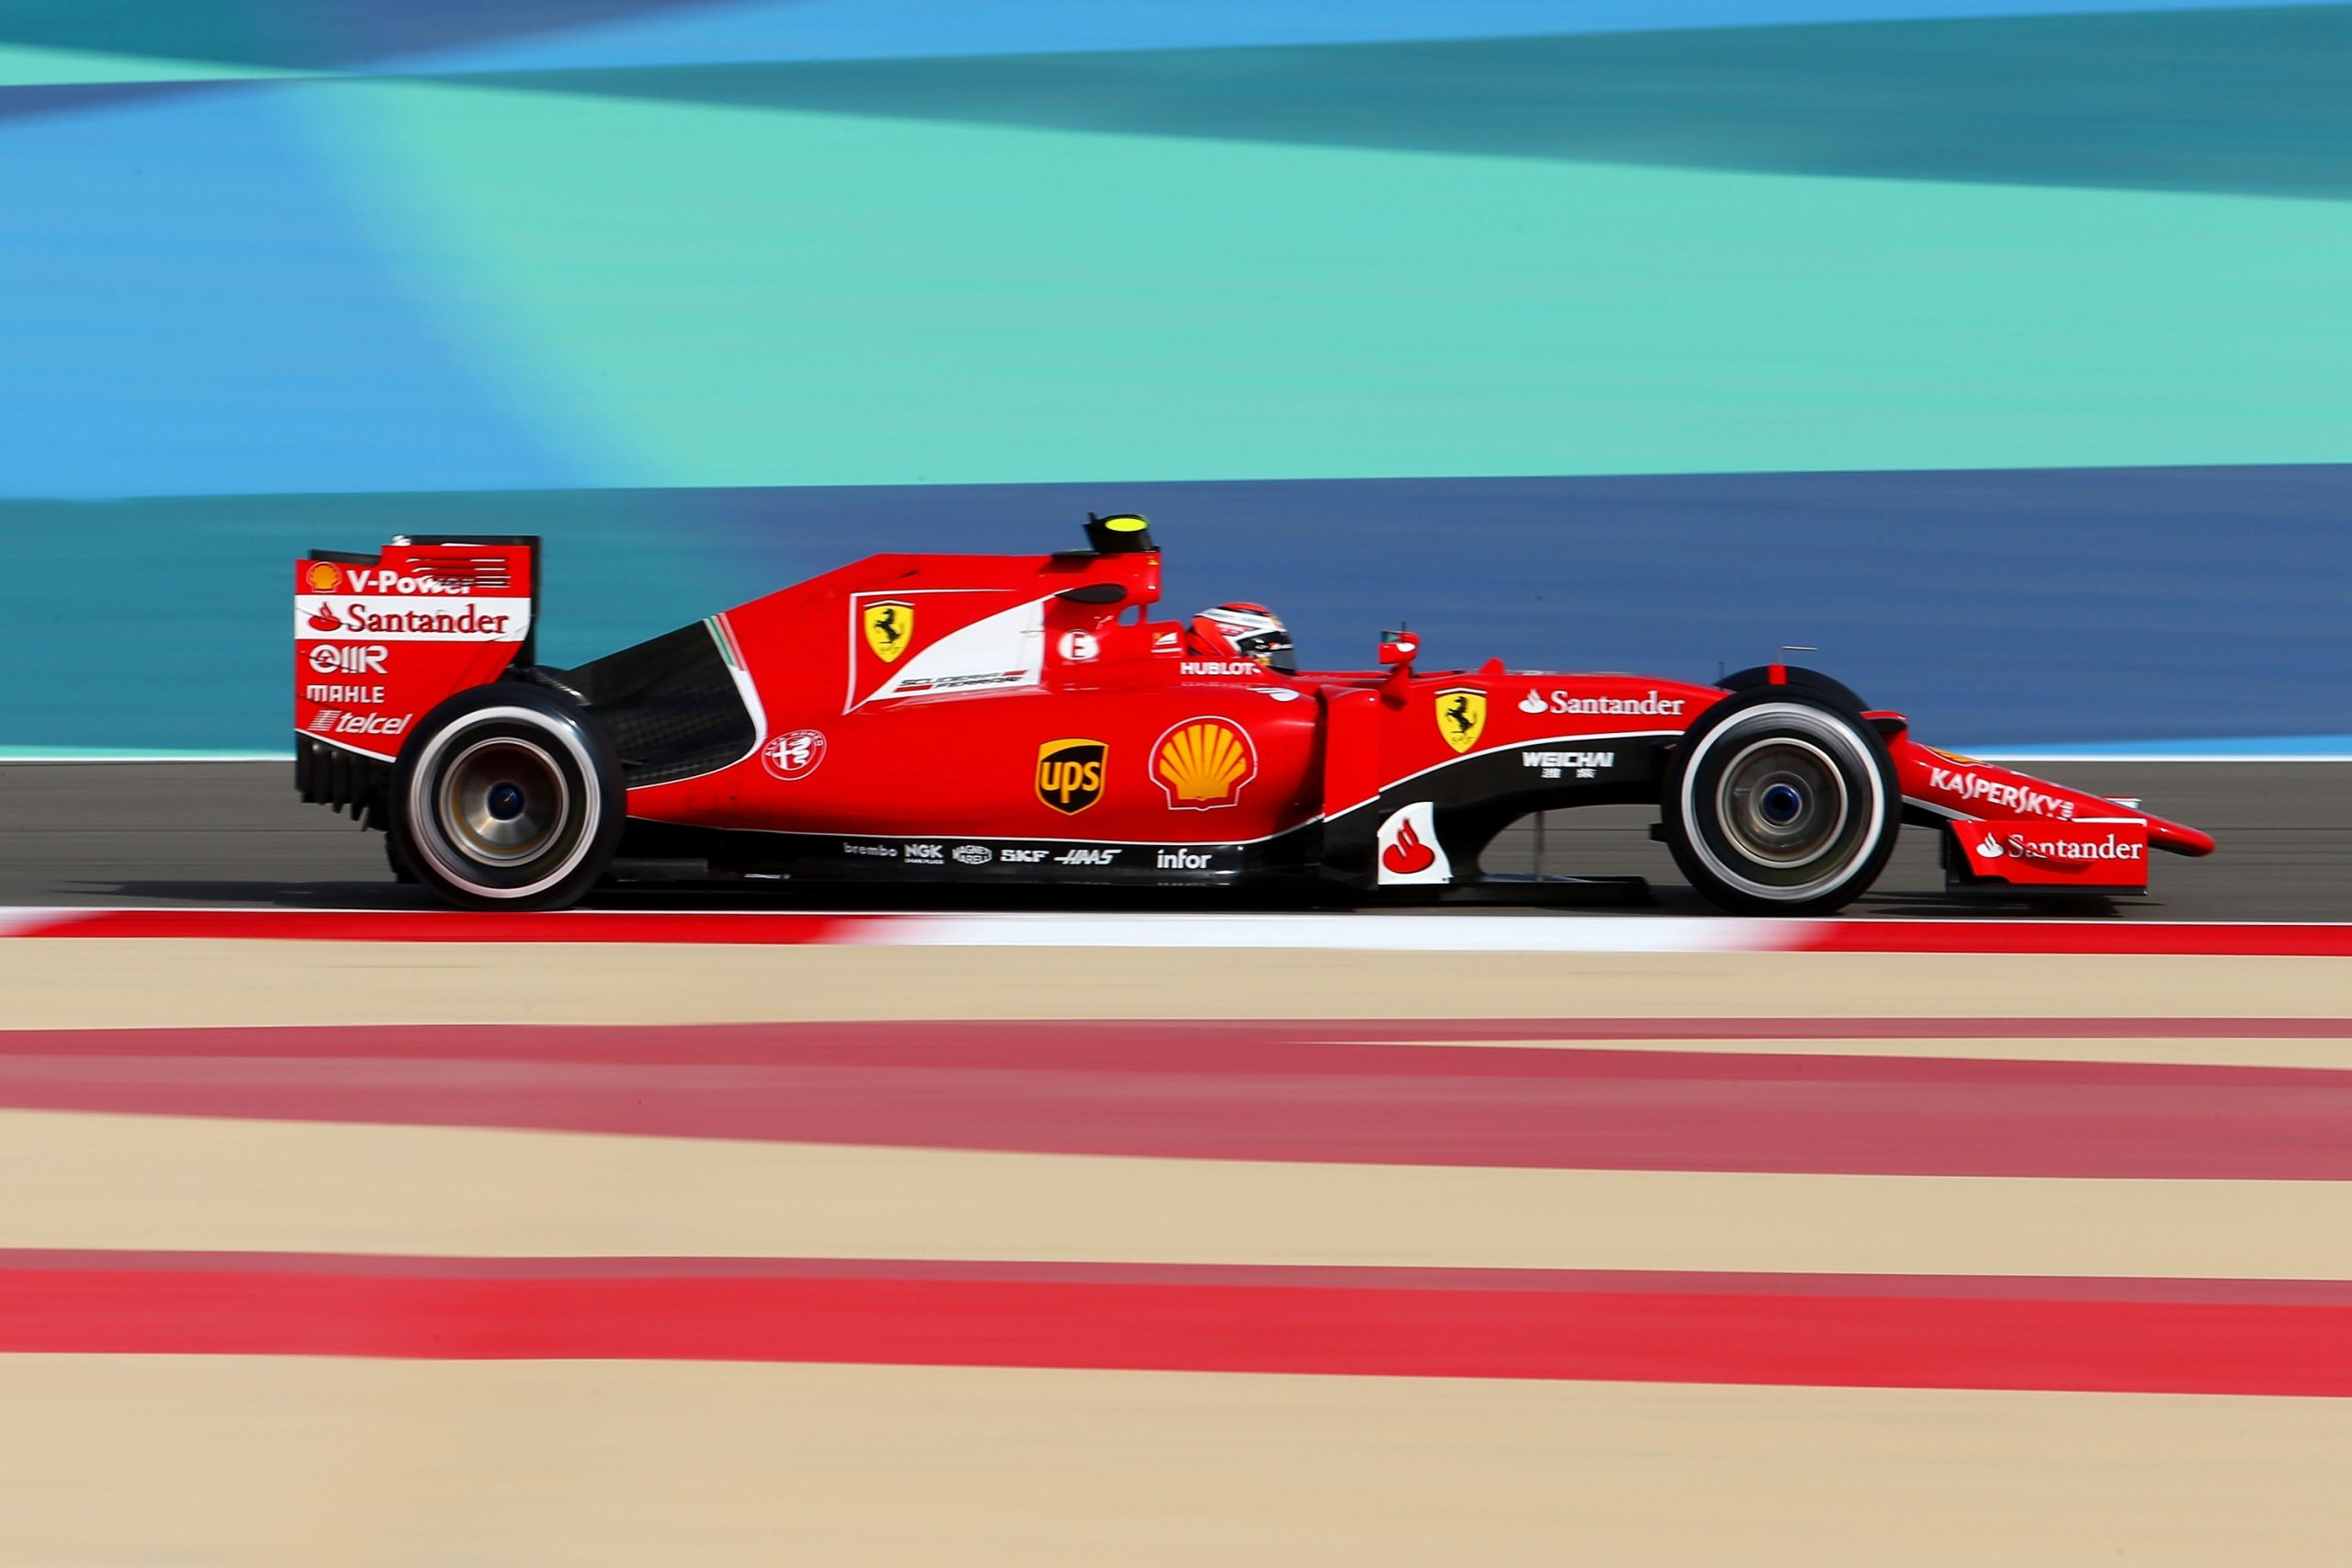 Ferrari during a F1 race